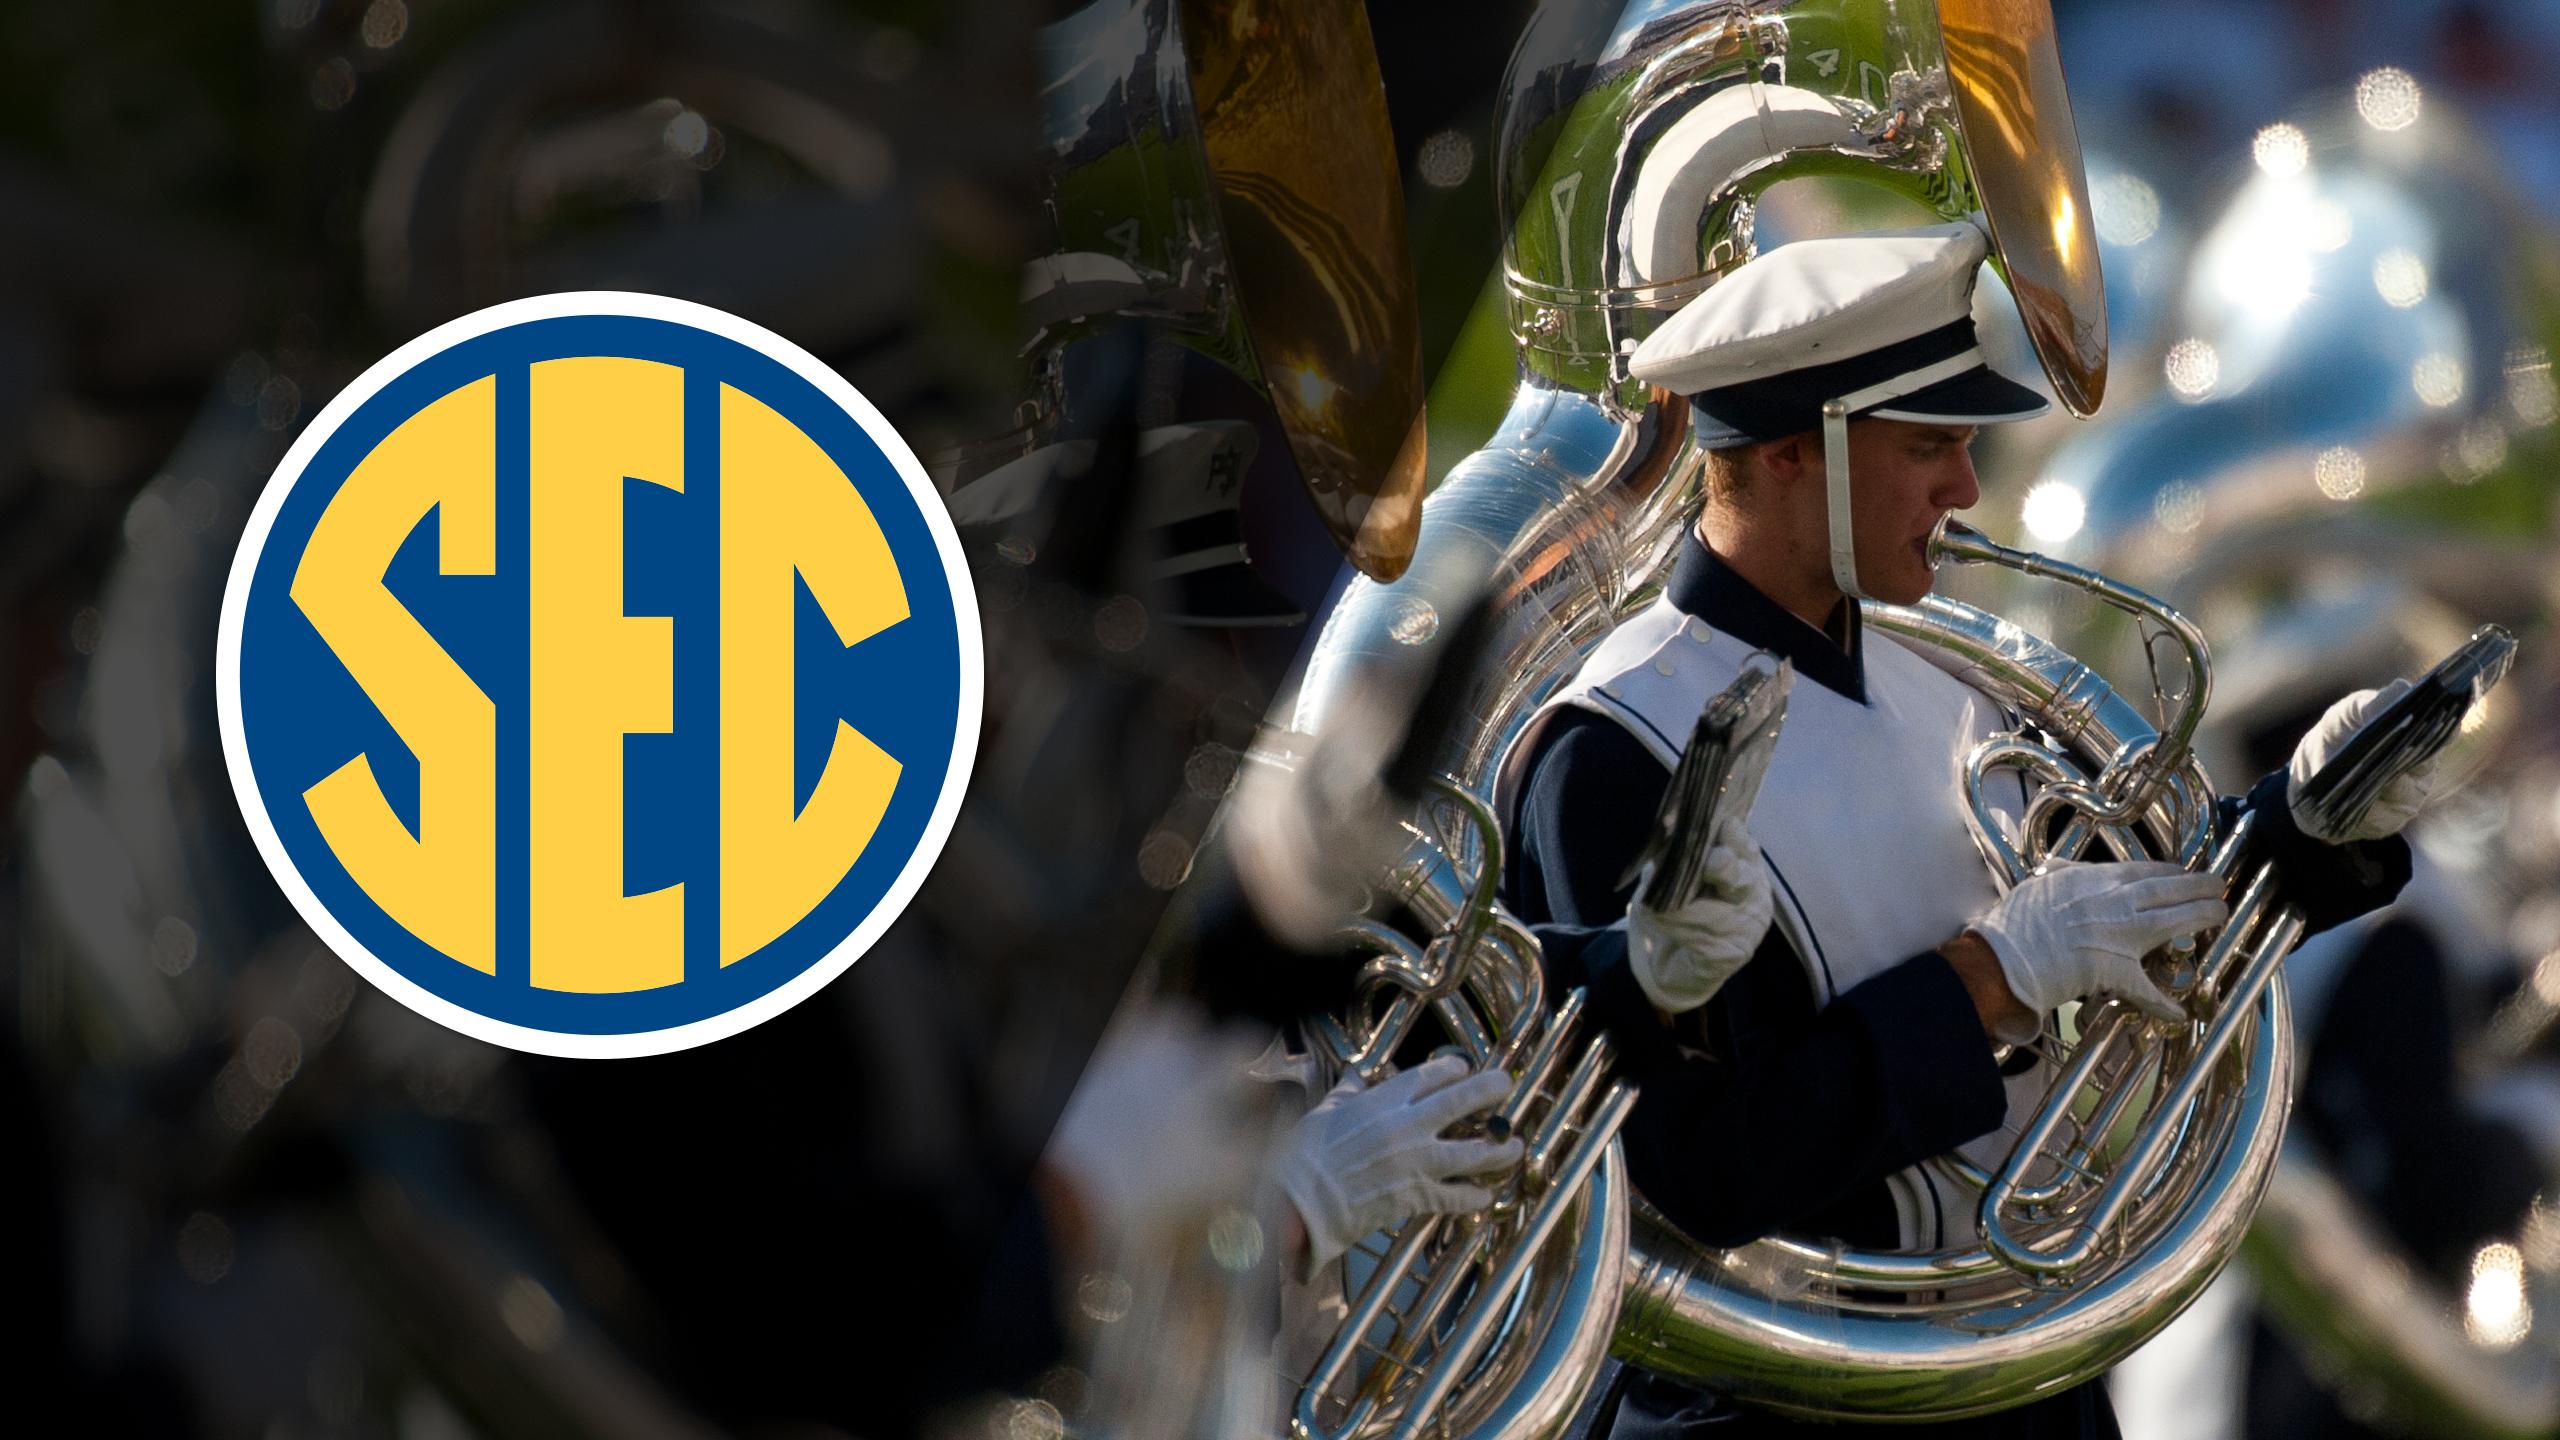 SEC Halftime Band Performances at Florida